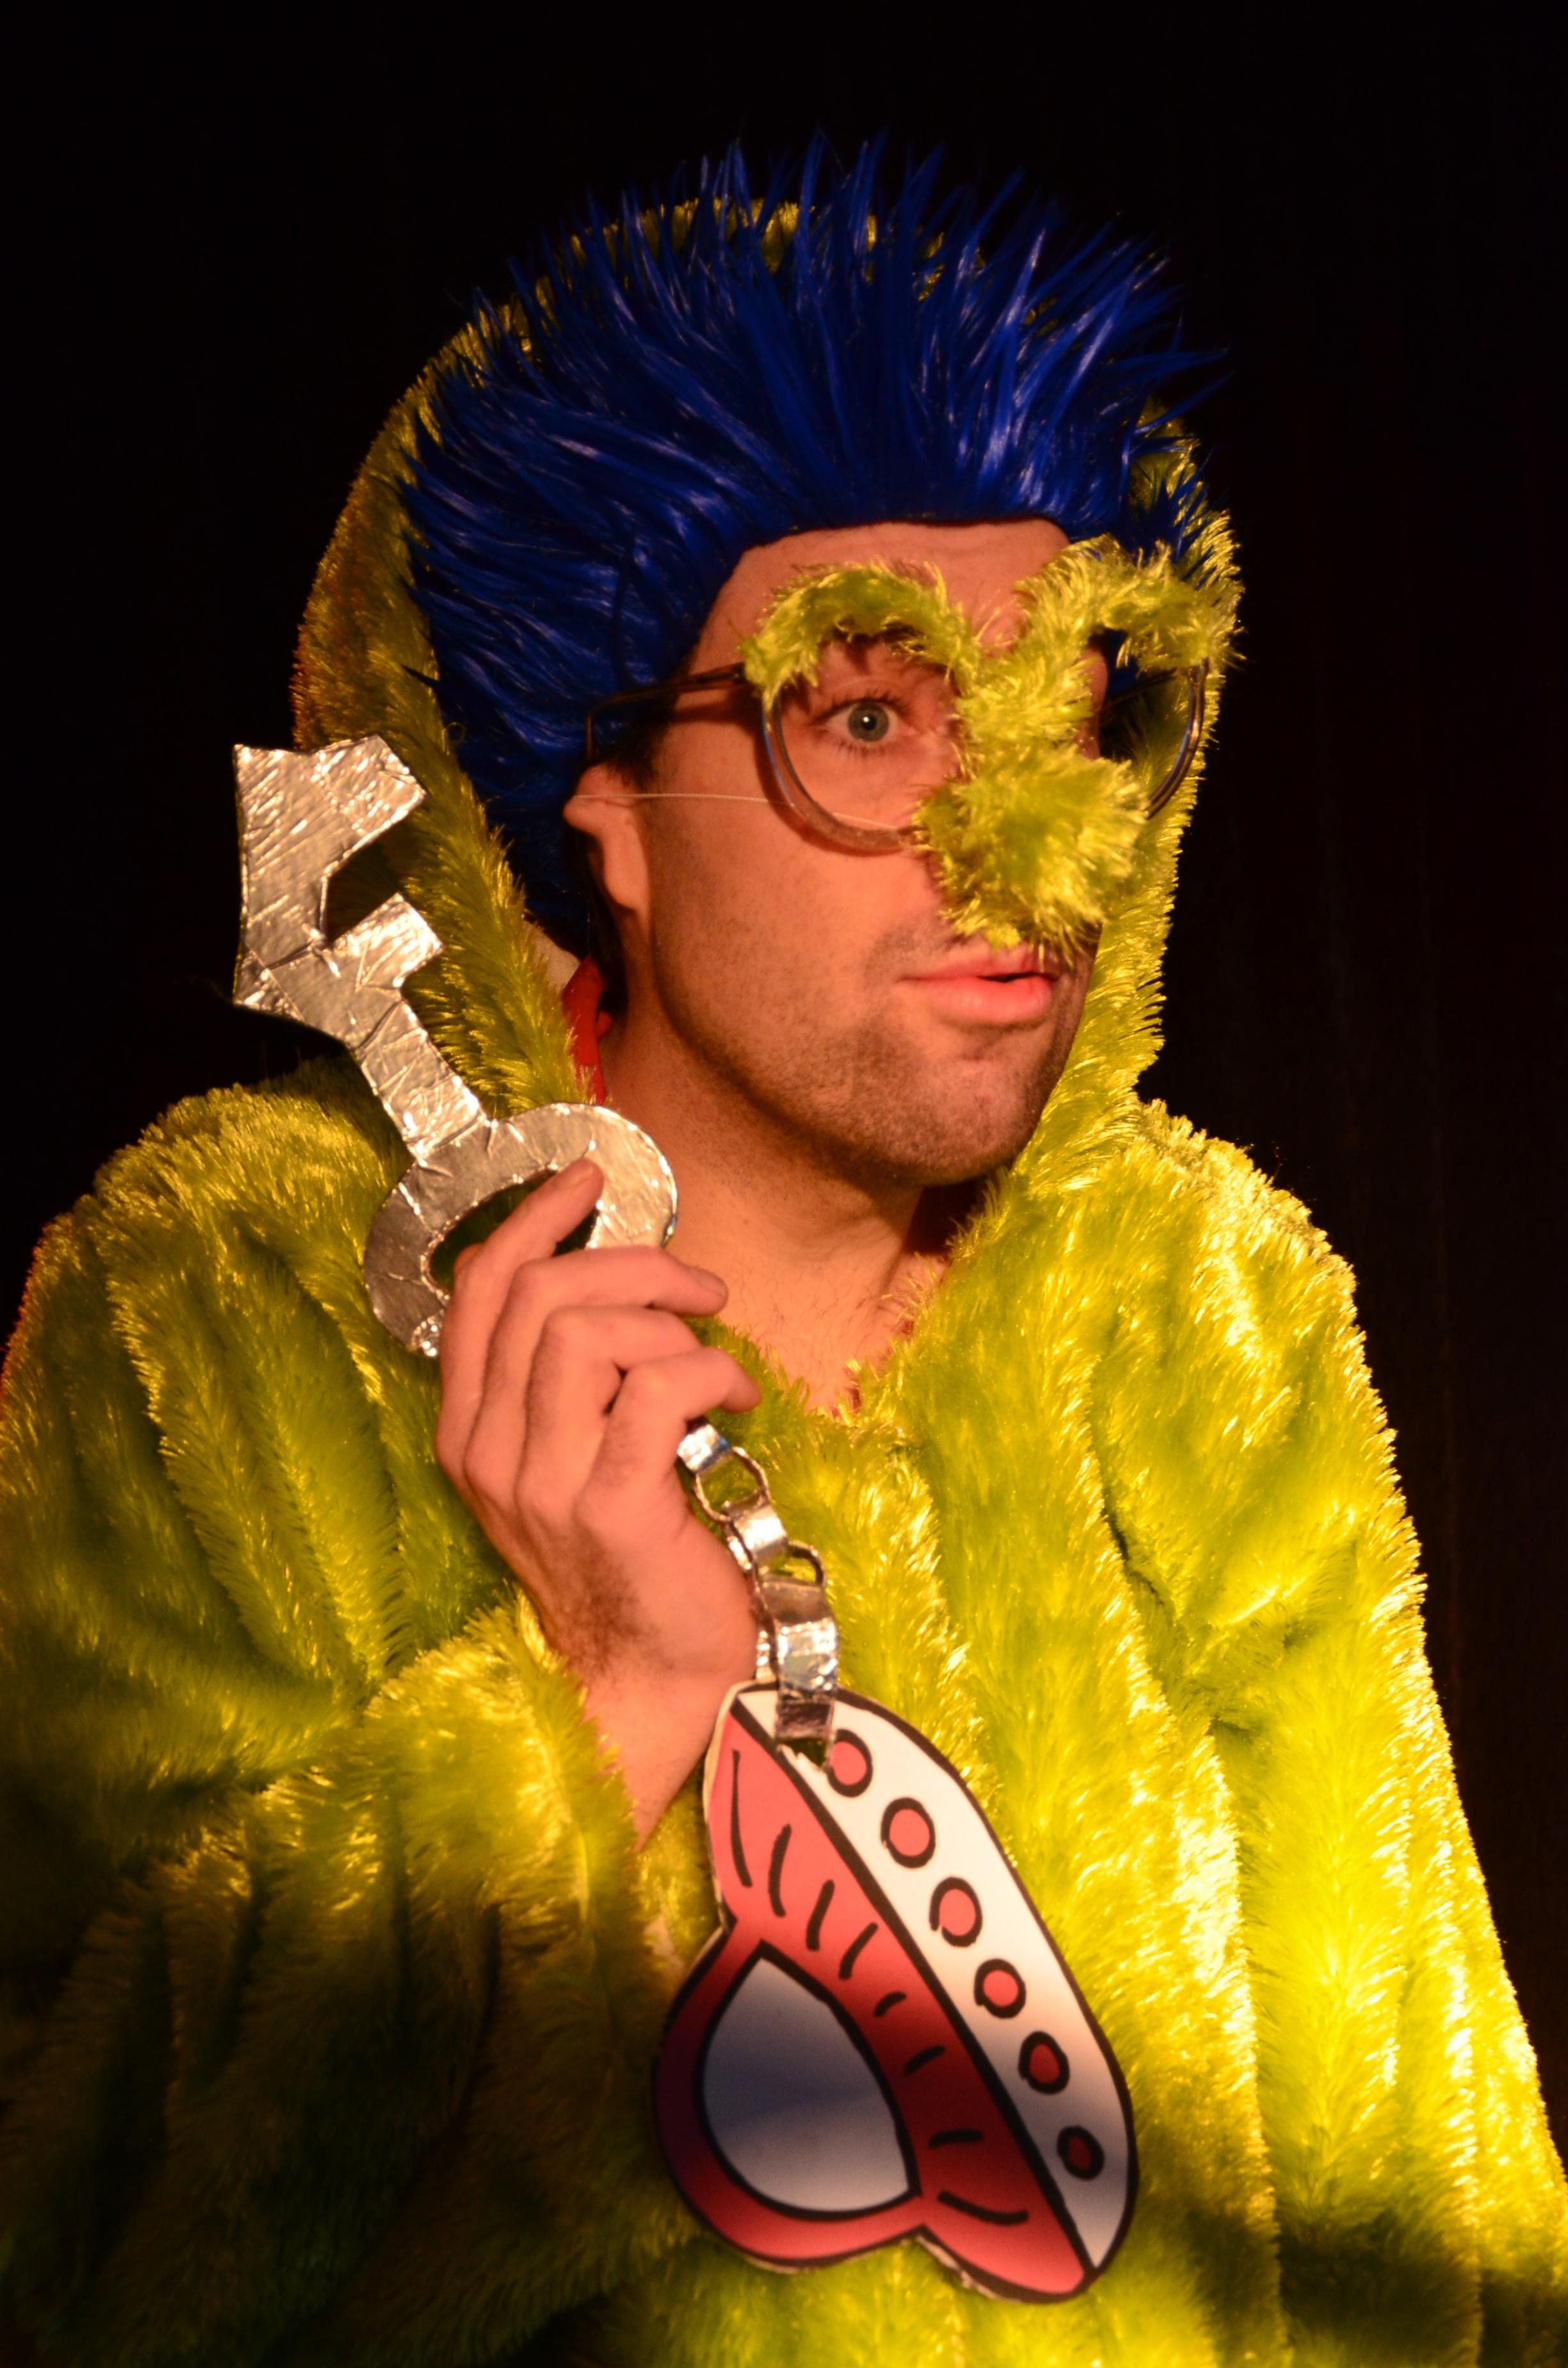 Zappalott Zauberer Auzerirdischer Kinderzauberer